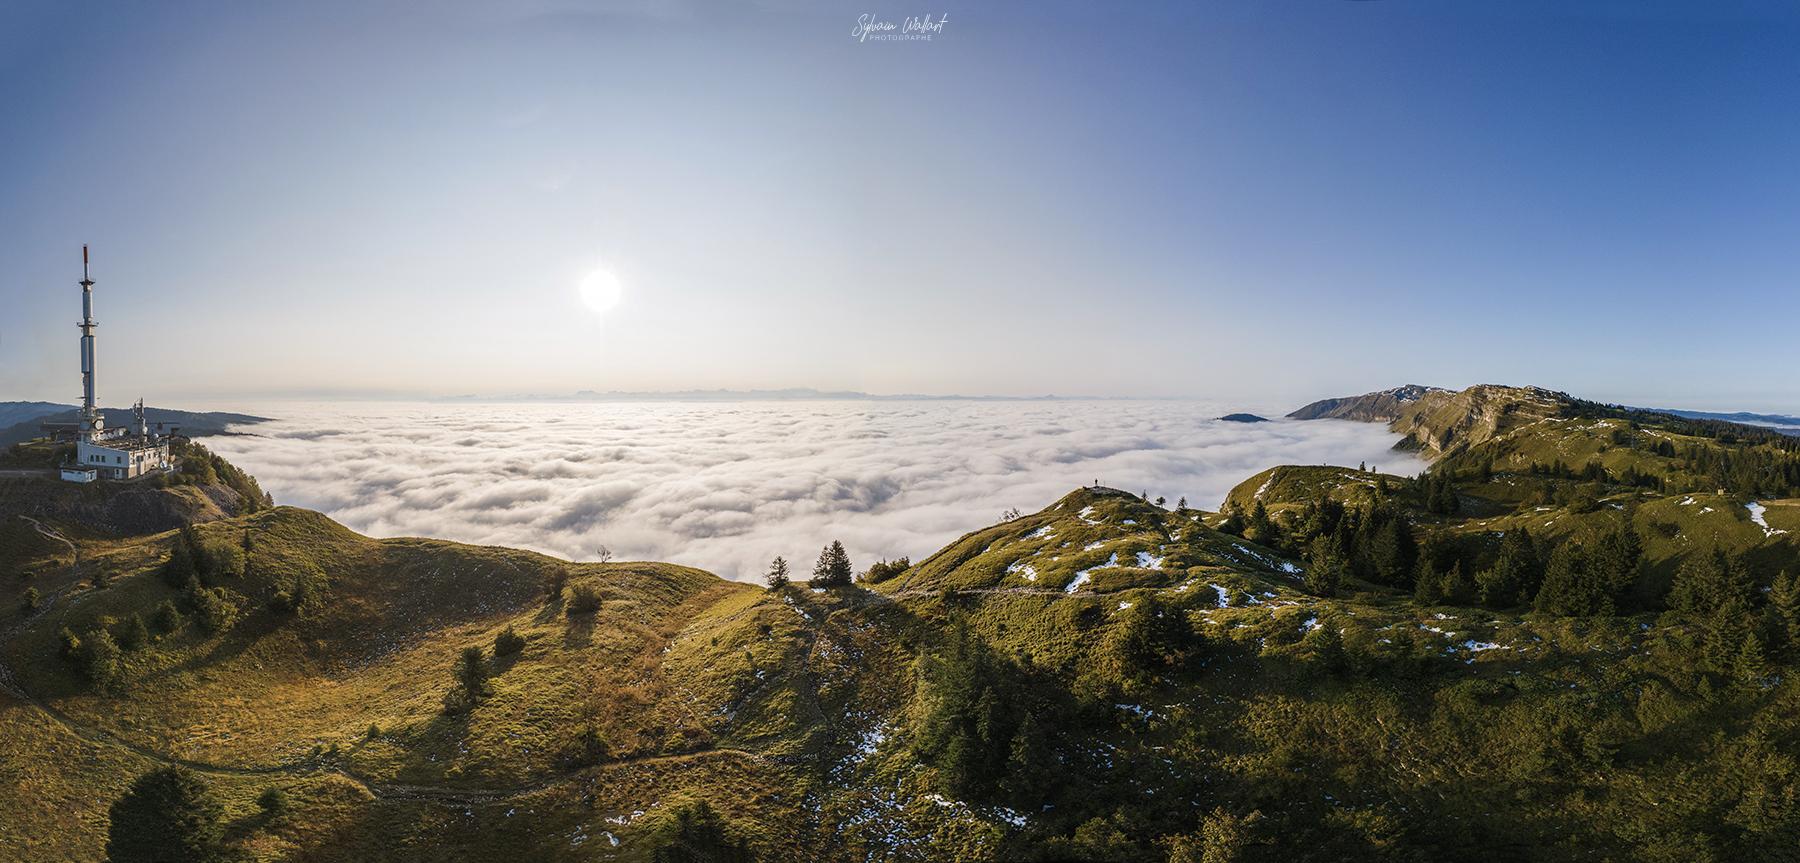 Le Jura, vidéo et photos du drone Mer-de-nuage_pano